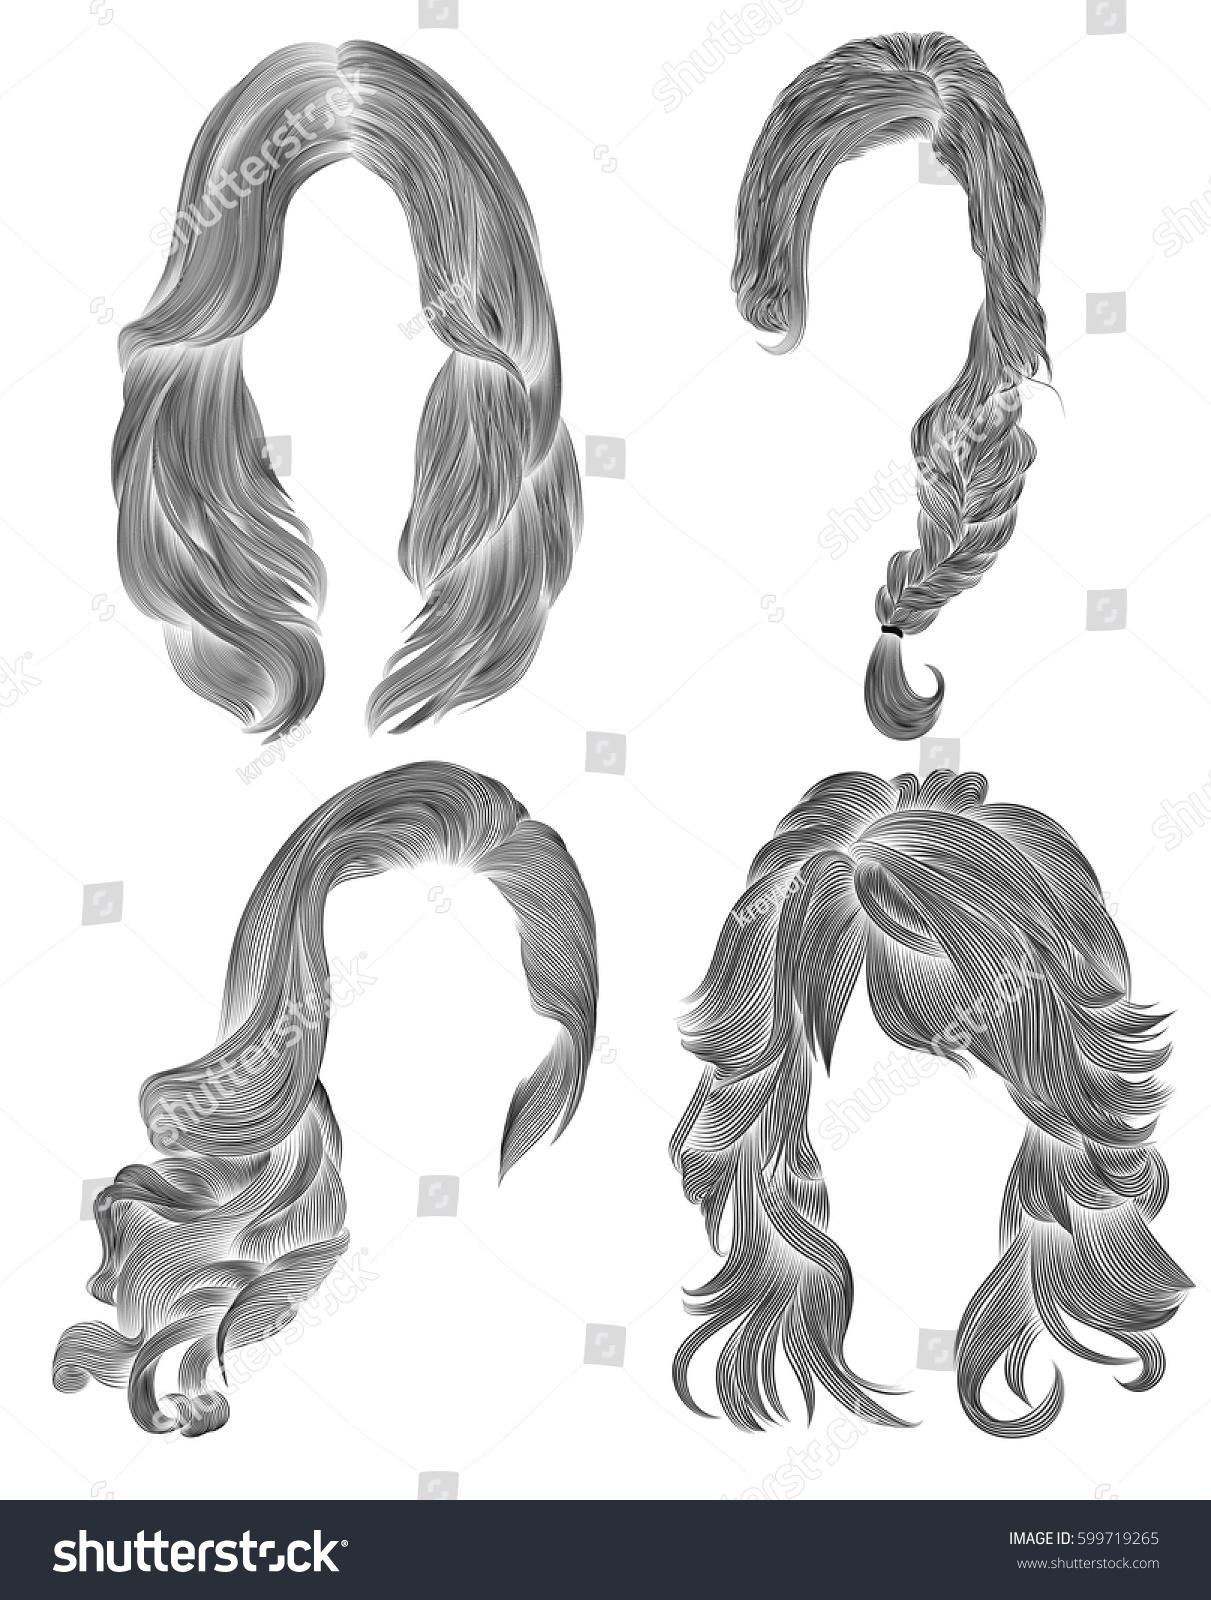 Set long woman hairs black pencil drawing sketch women fashion beauty style fringe